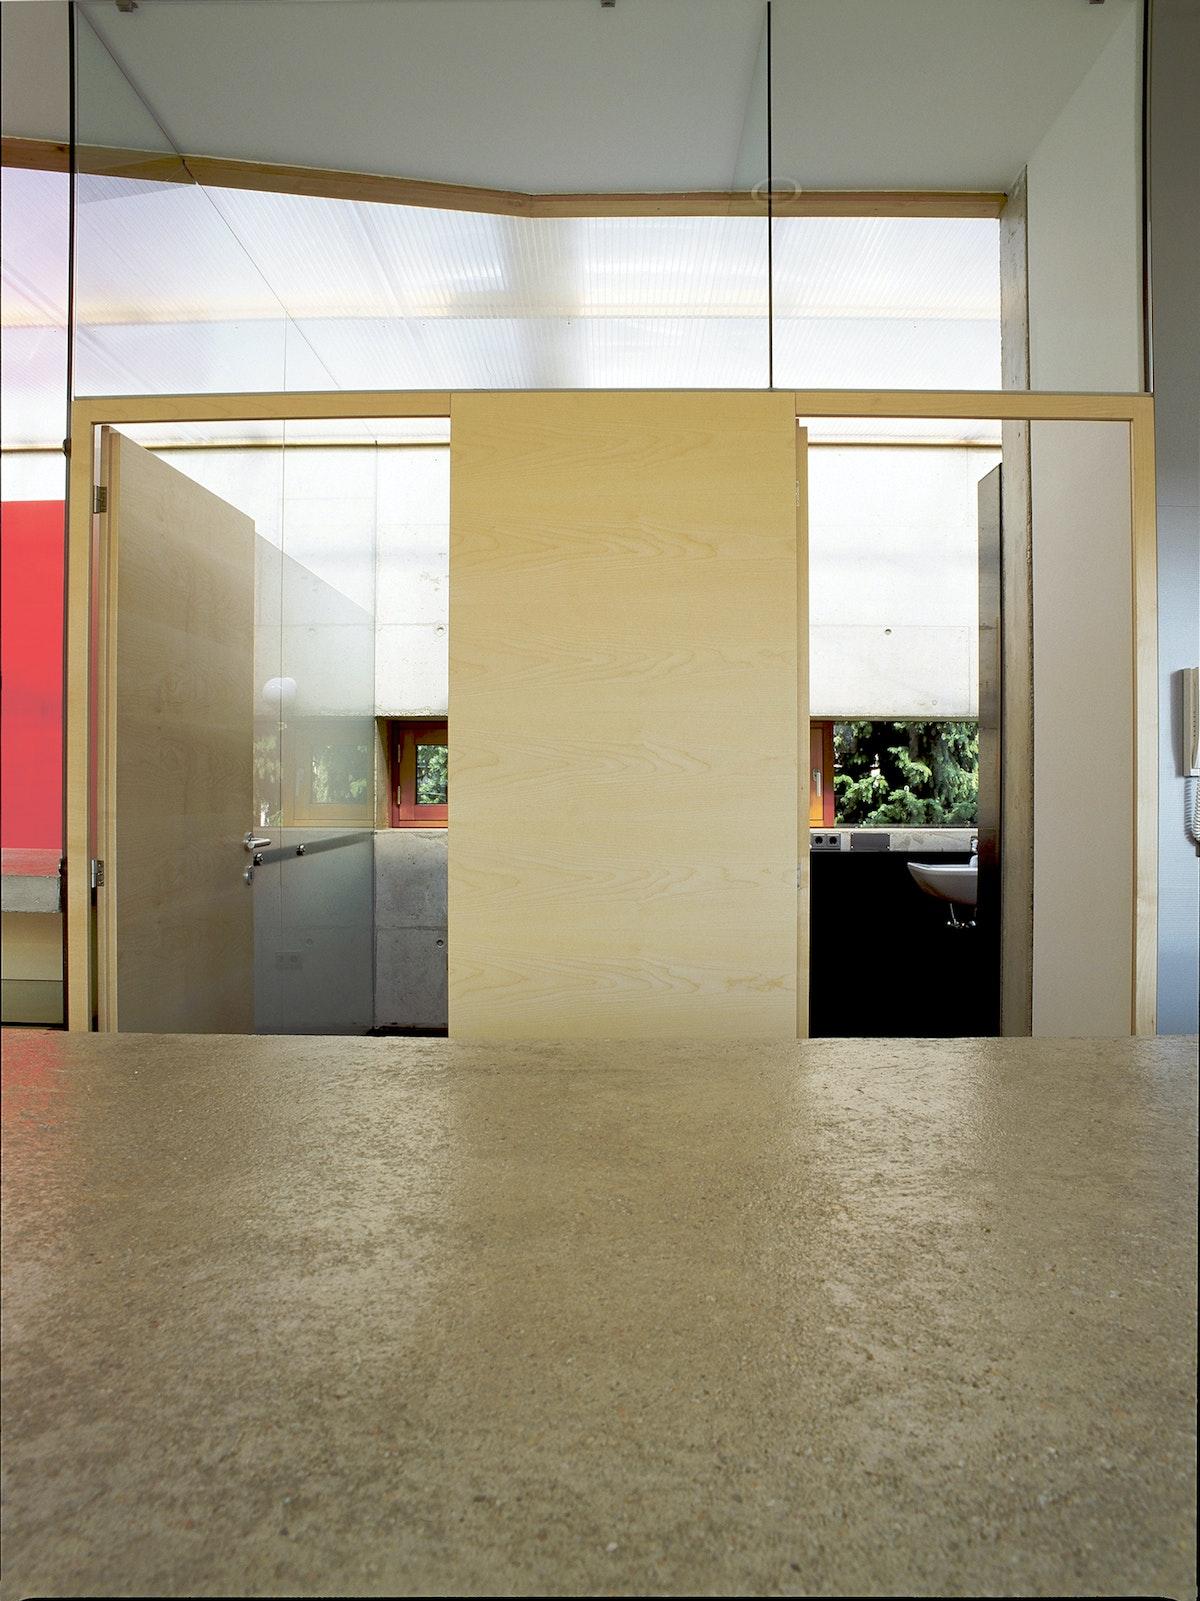 Solar Deck Lew Rodin 79020042